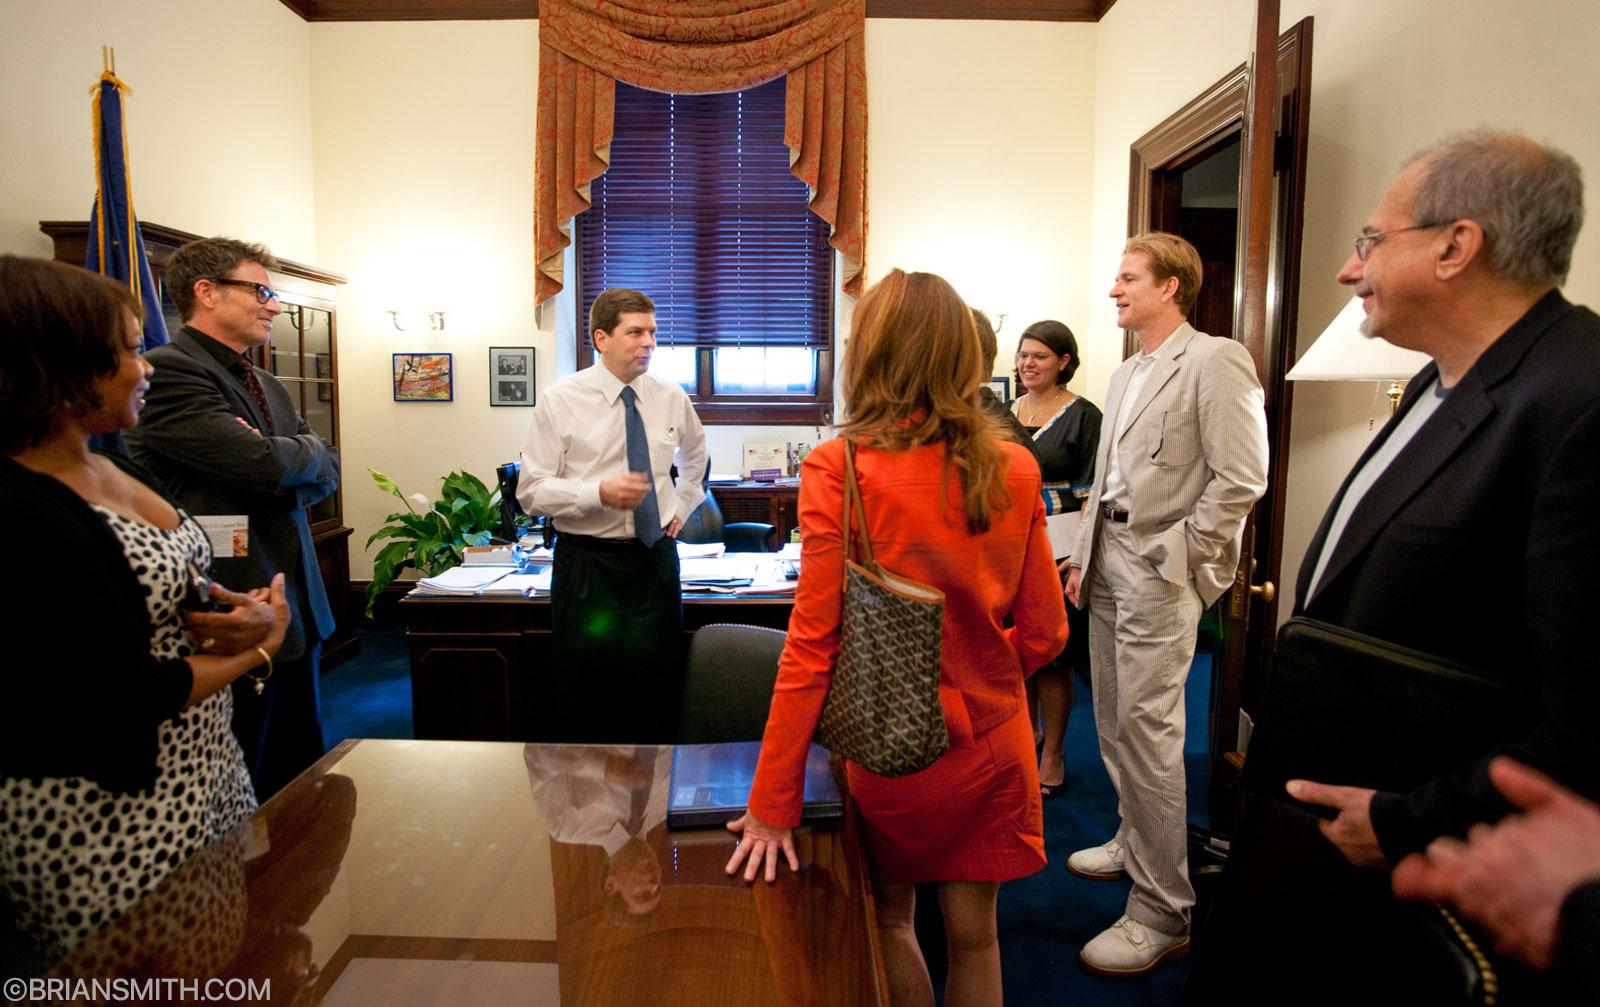 Alfre Woodard, Tim Daly, Dana Delany and Matthew Modine of The Creative Coalition meet with Senator Mark Begich